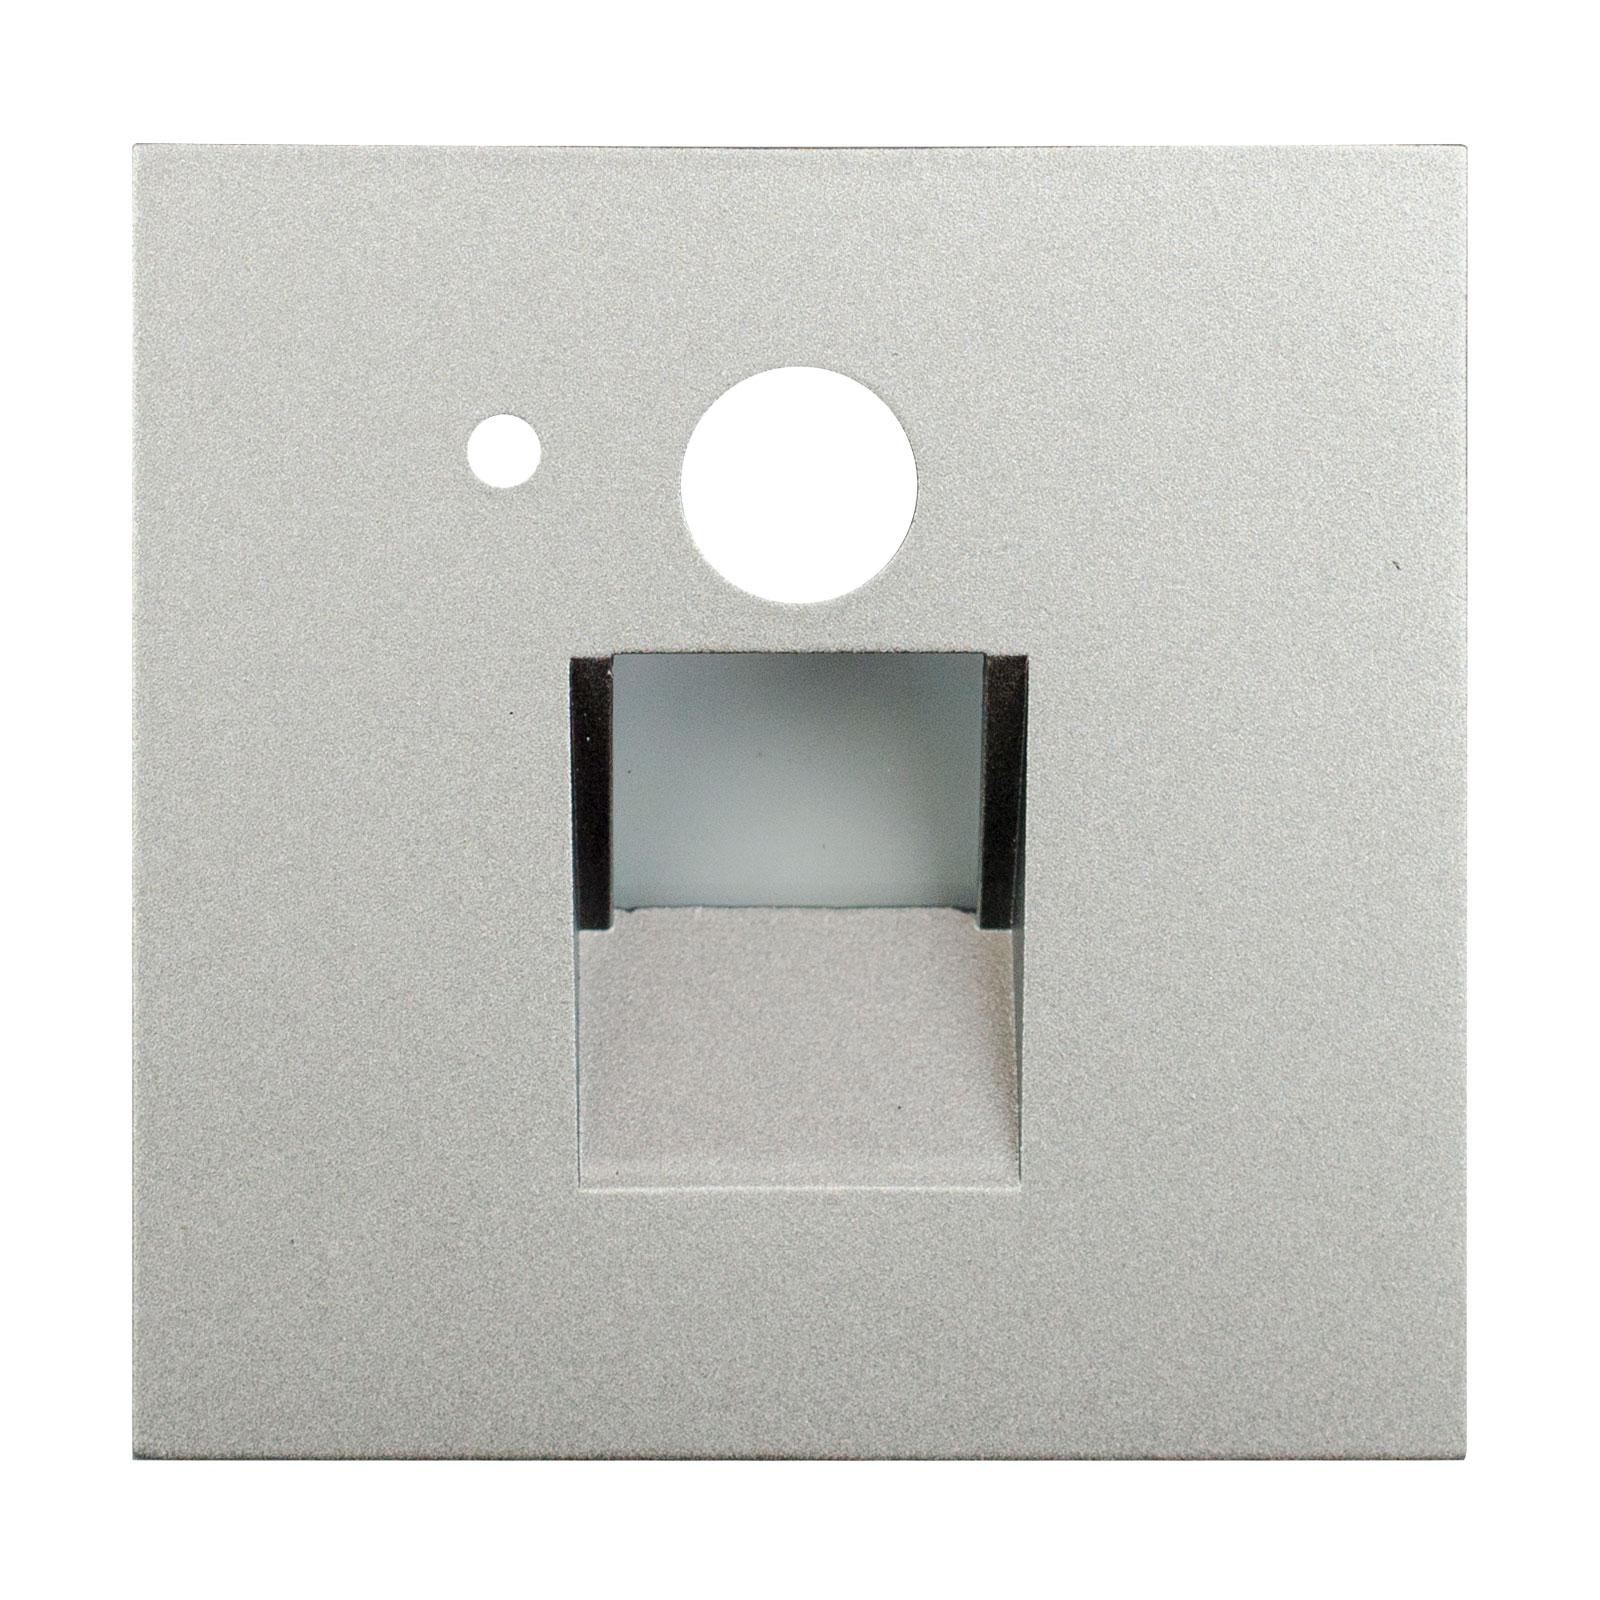 Arcchio Neru LED-Einbaulampe, Sensor eckig silber